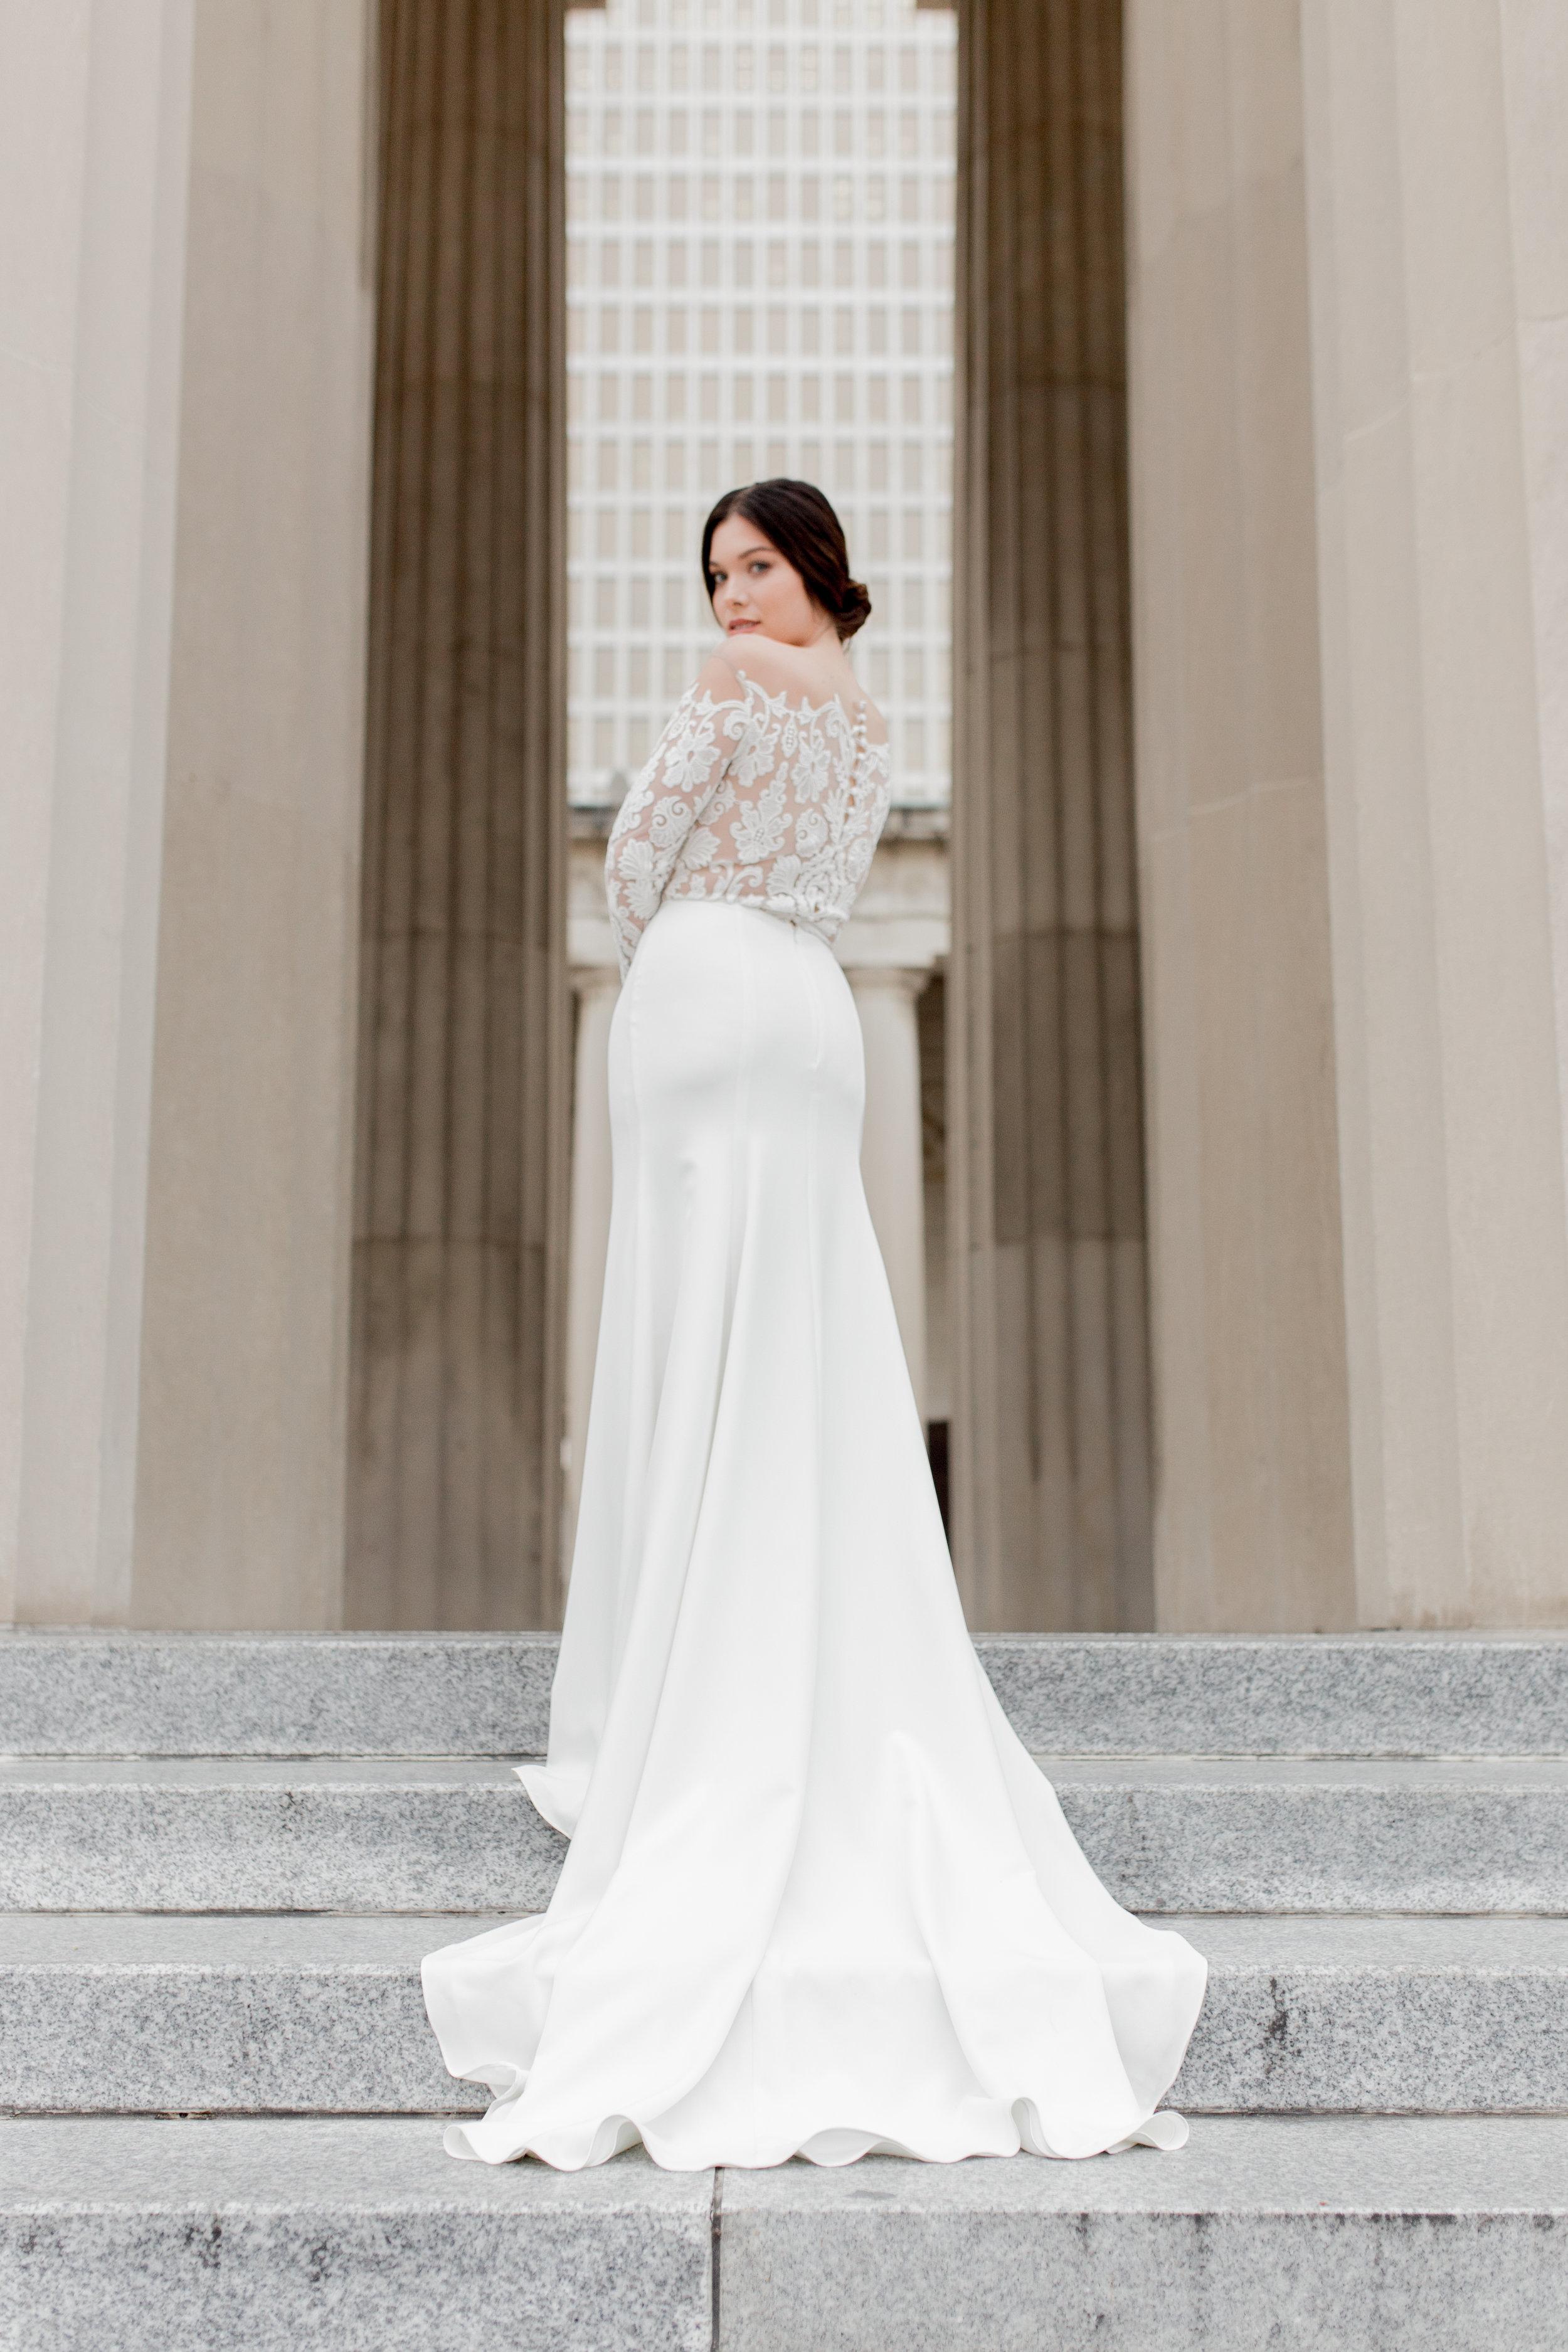 long-train-wedding-dress